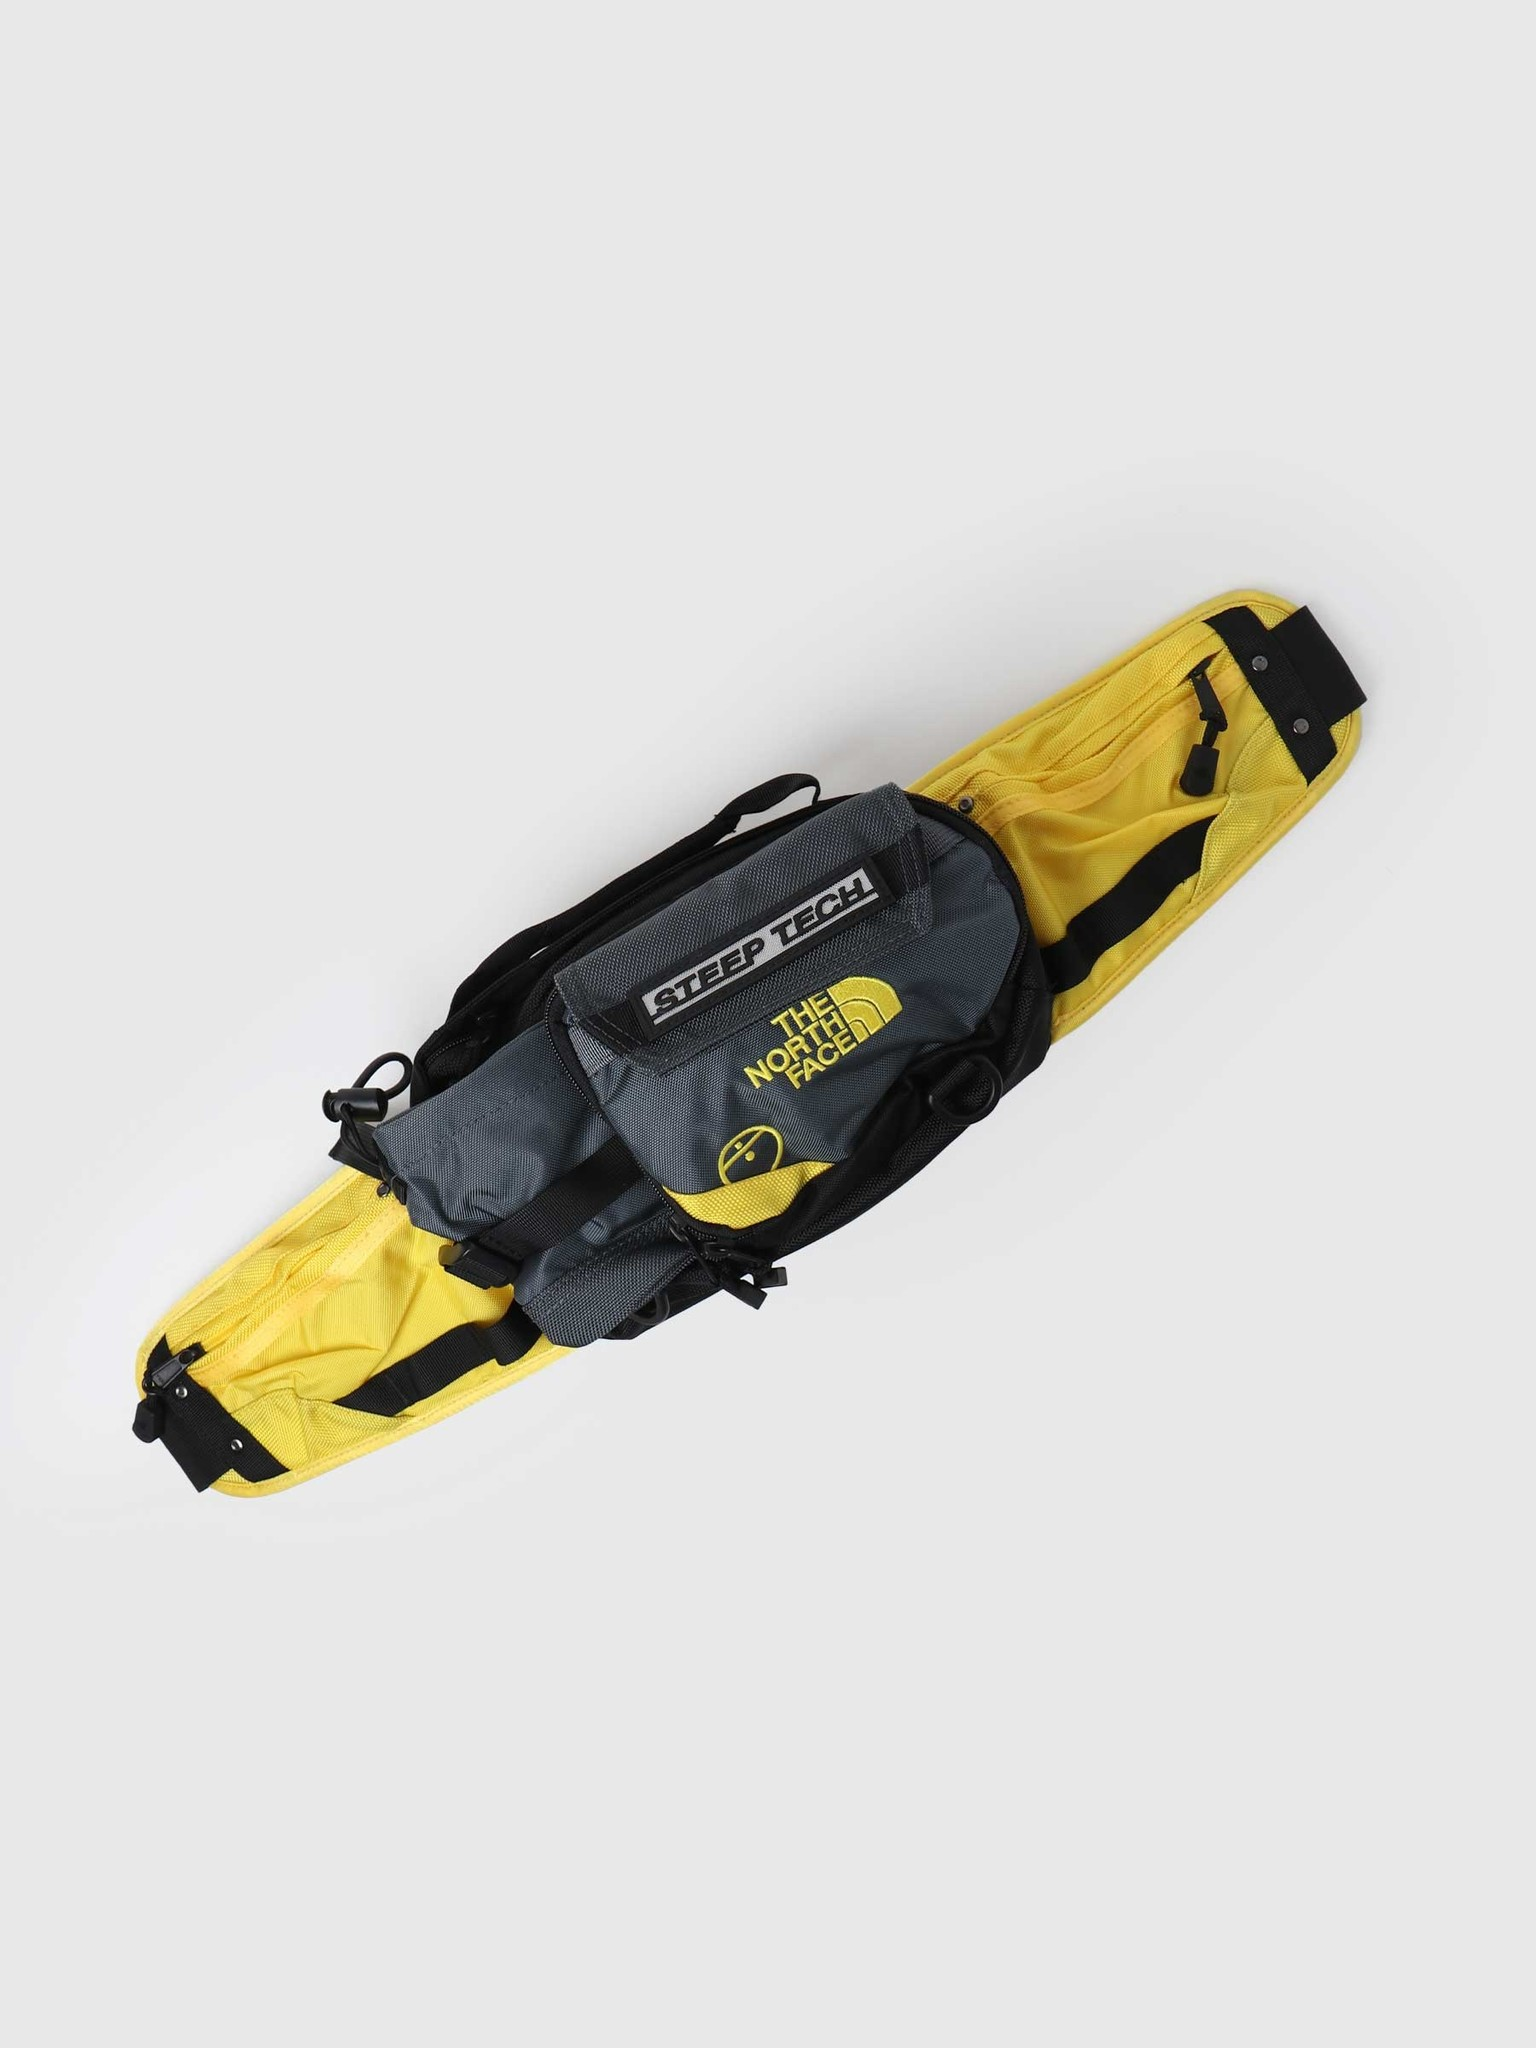 The North Face The North Face Steep Tech Fanny Pack Vanadis Grey Lightning Yellow NF0A4SJ4TJB